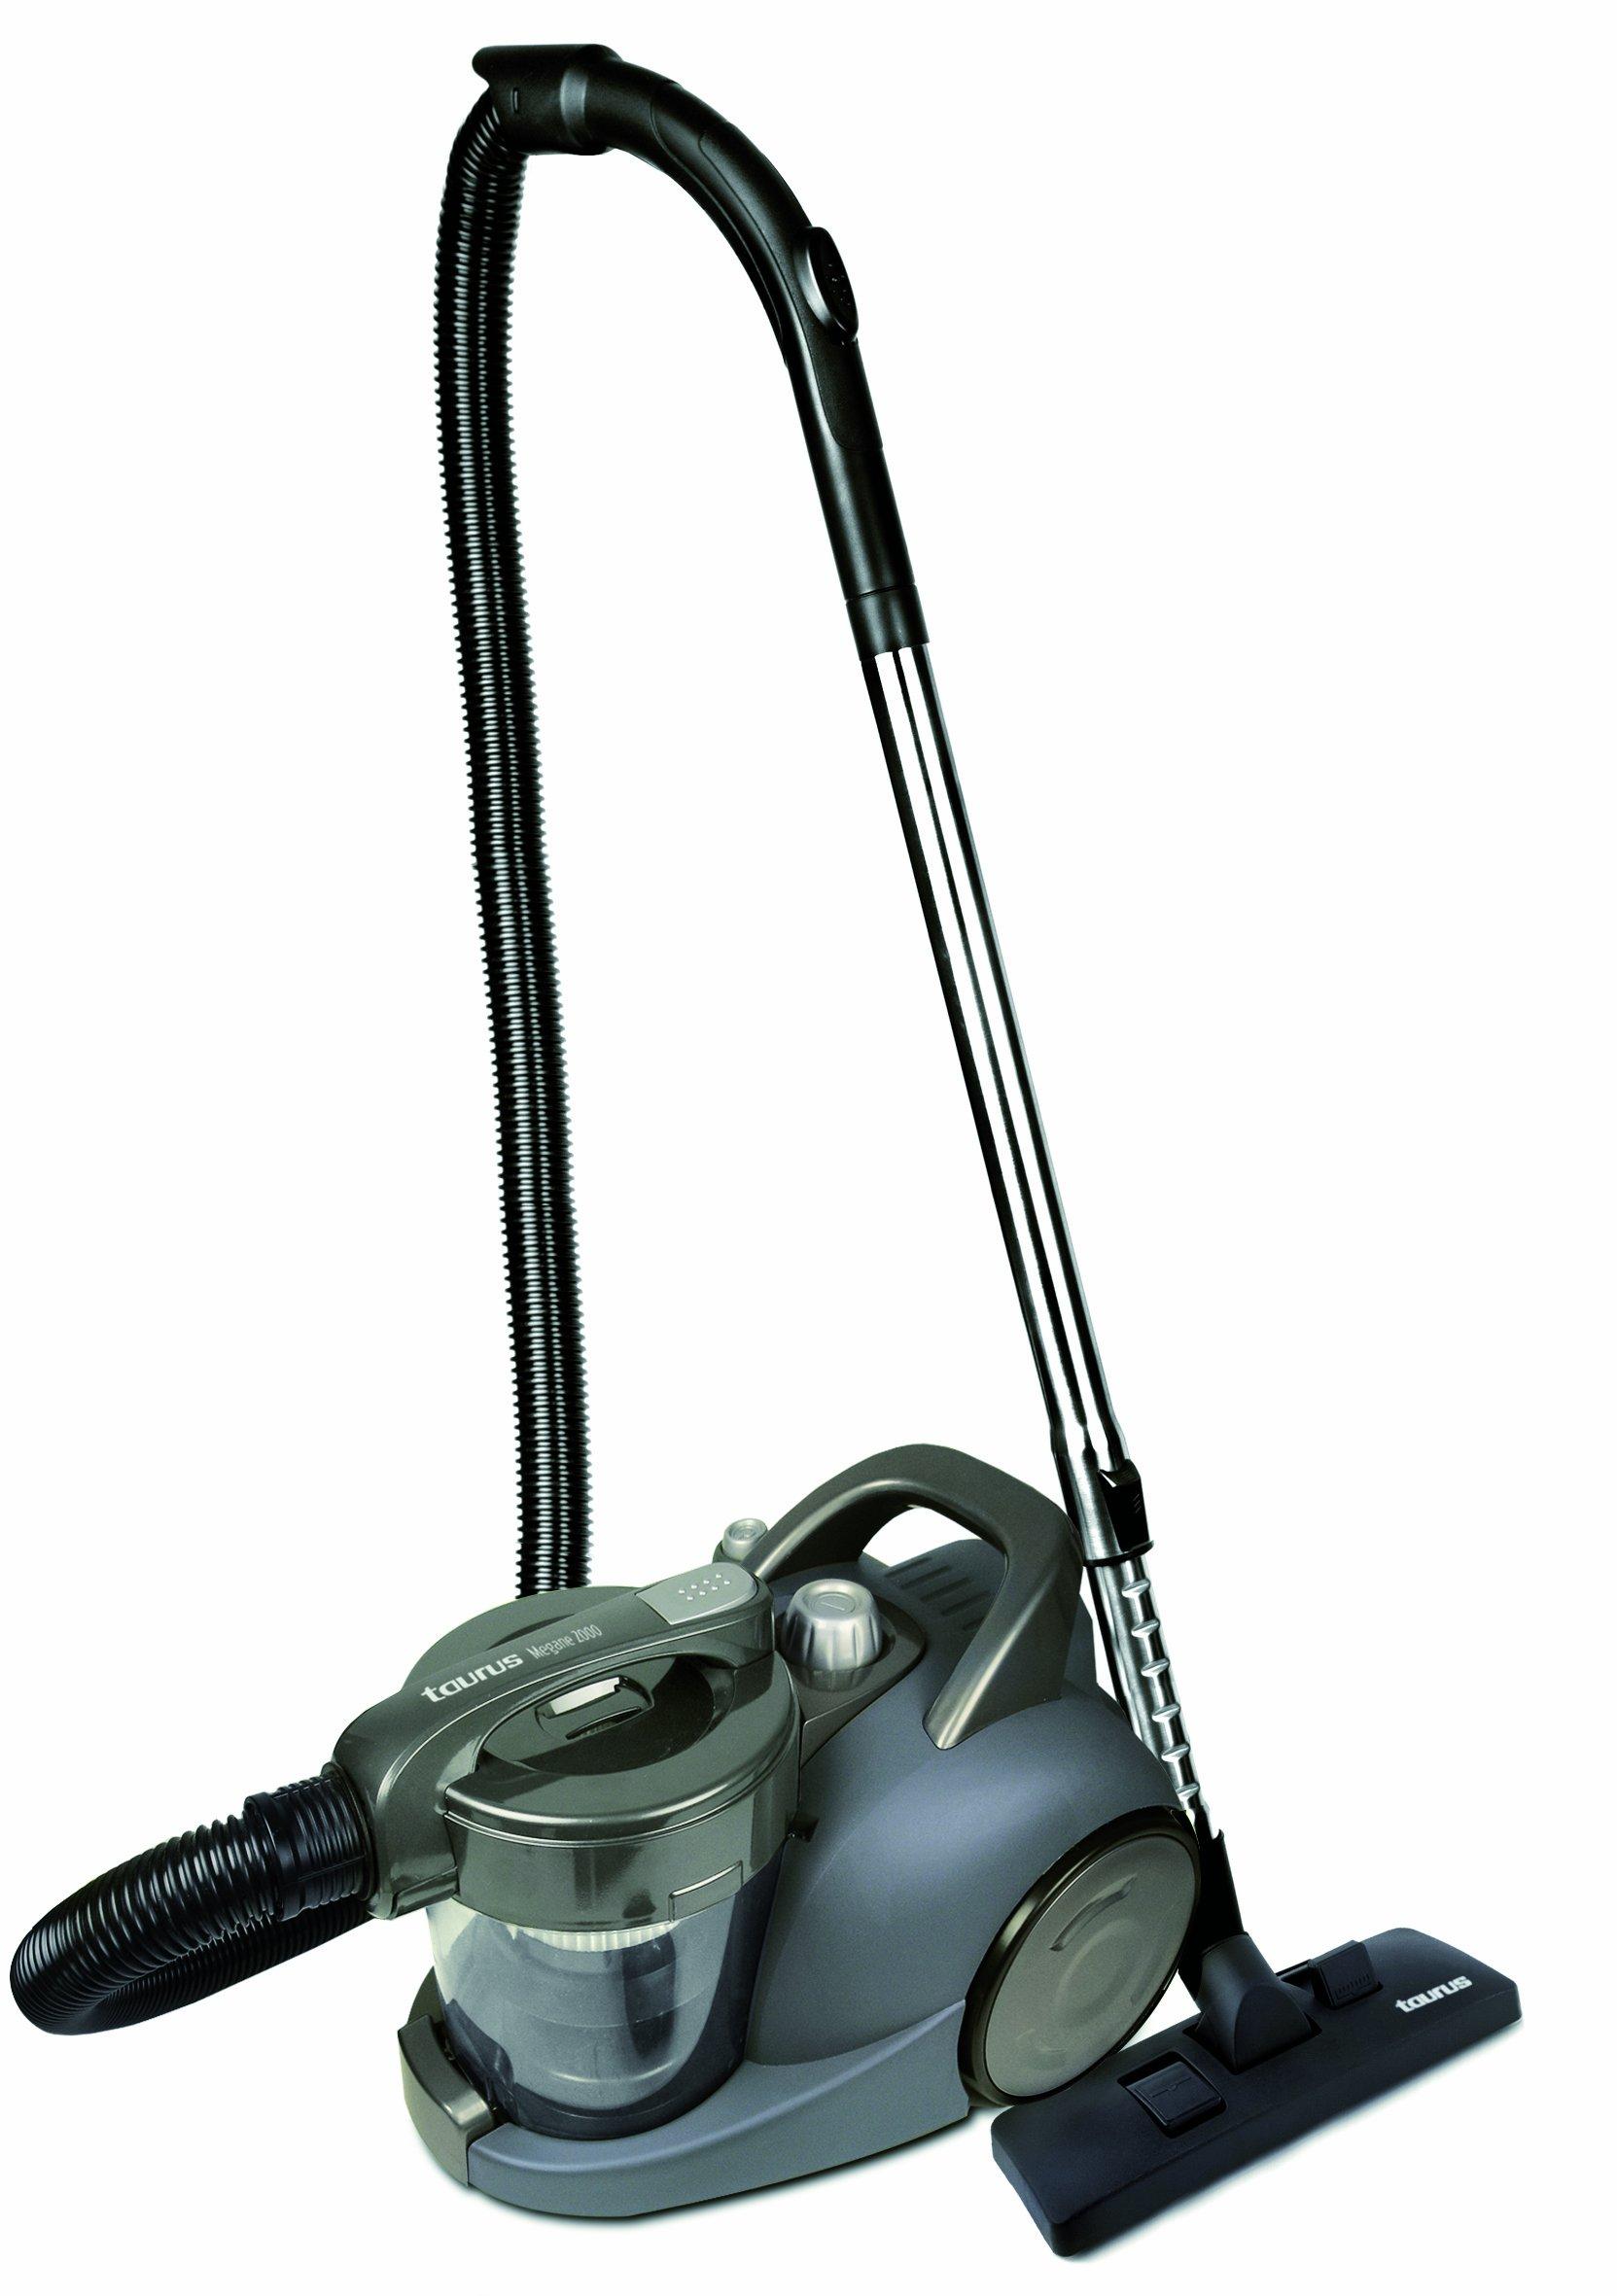 Taurus Megane 2000 Advance - Aspirador, 2000W, sin bolsa, 2.5L, color gris: Amazon.es: Hogar